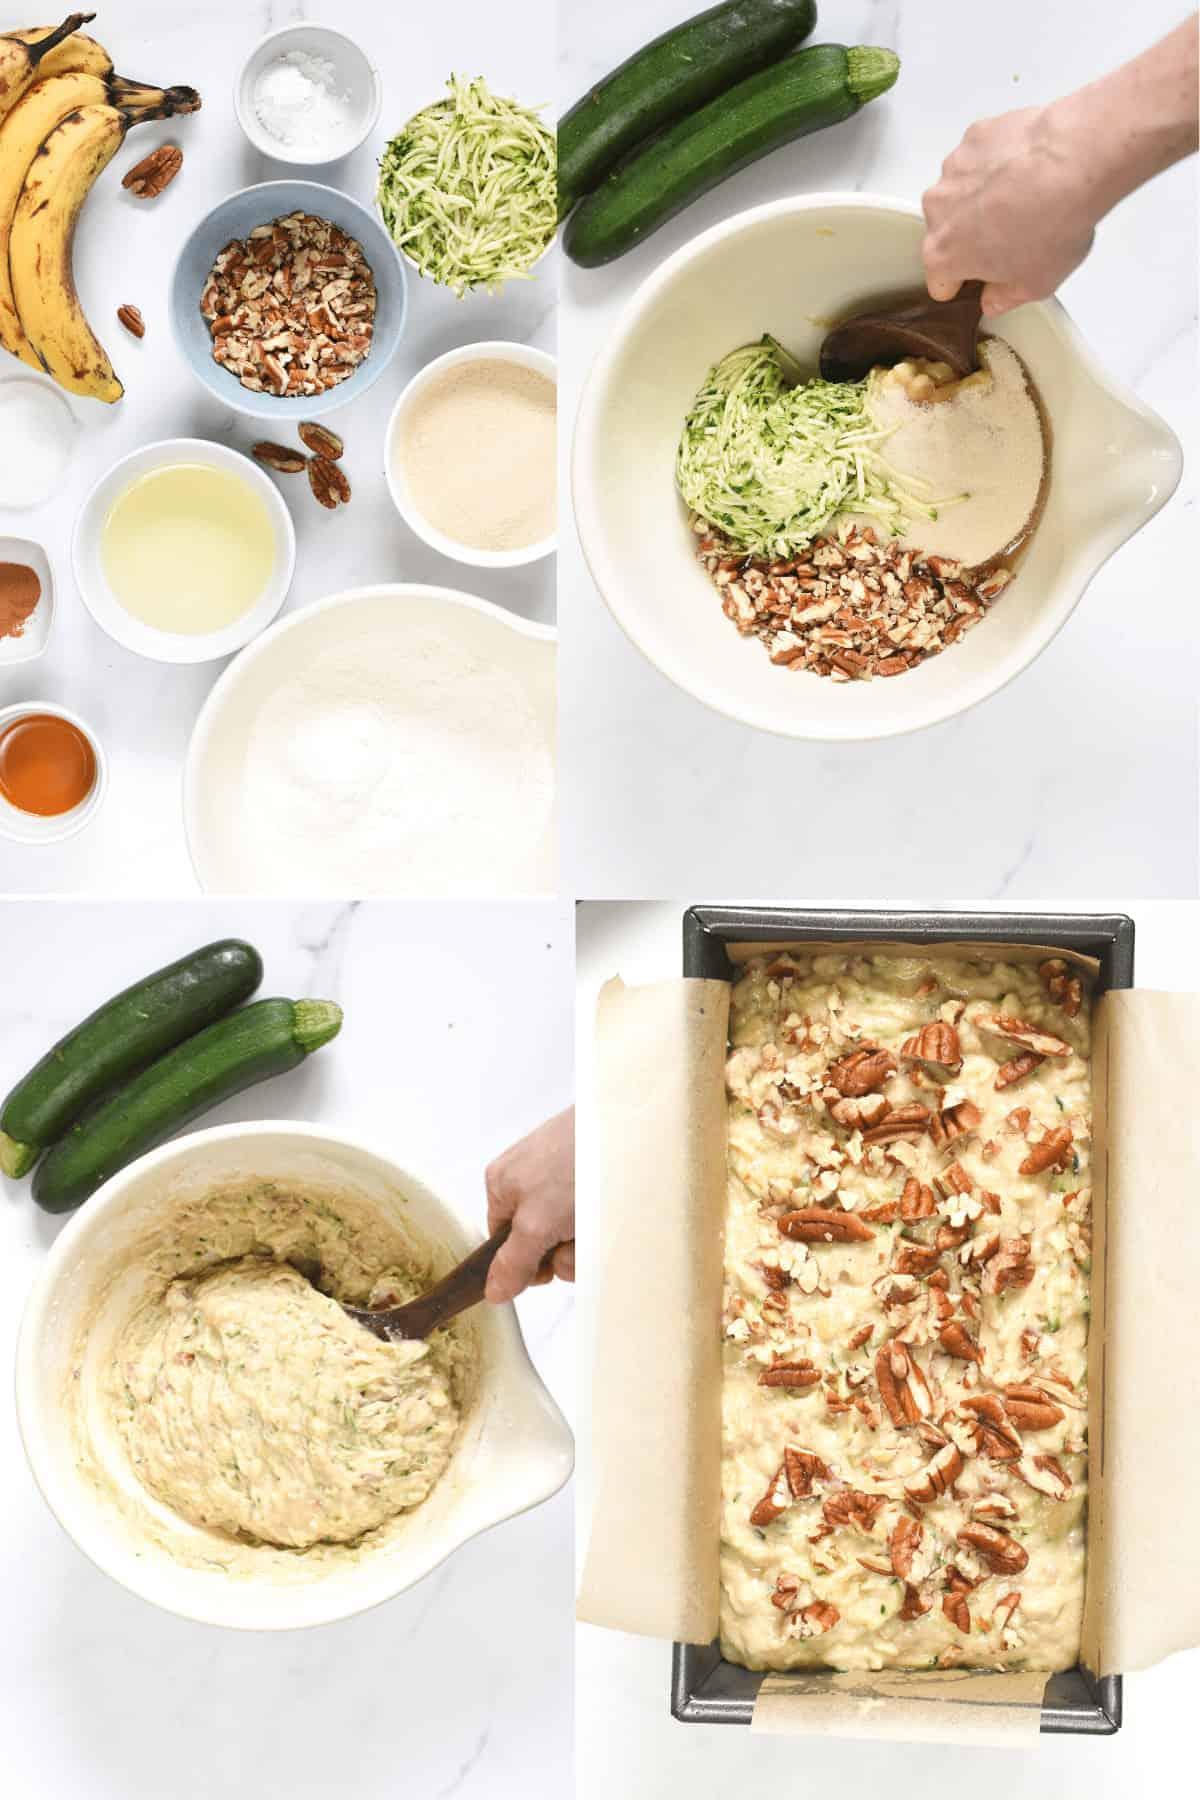 How to Zucchini Banana Bread